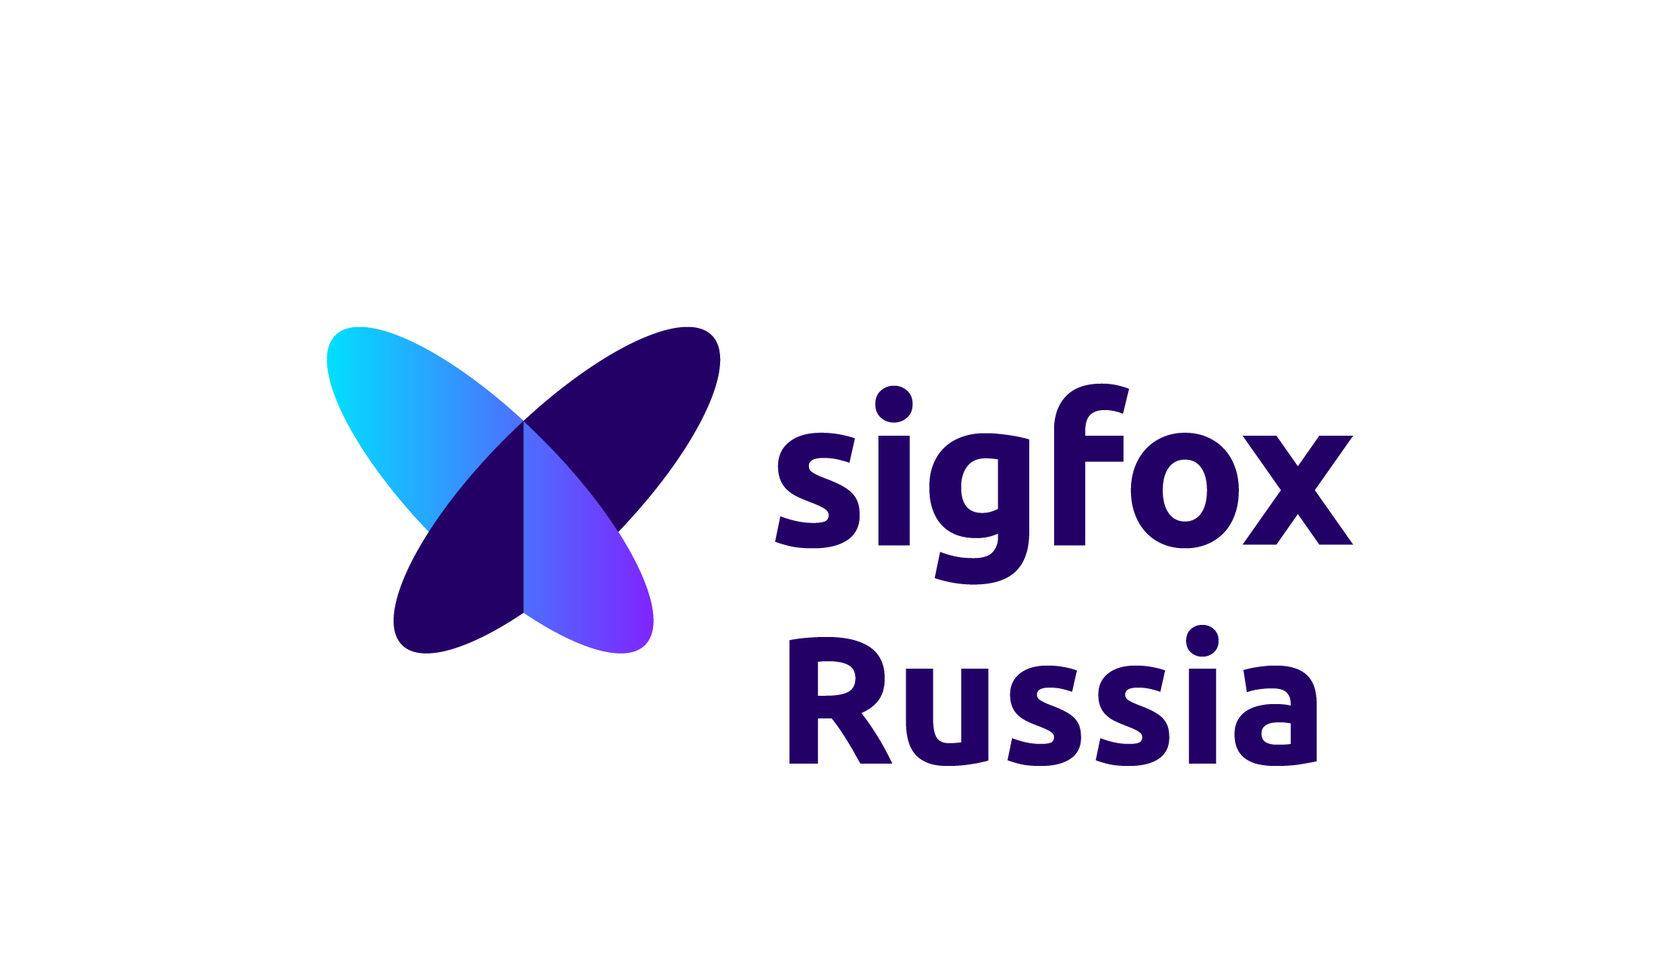 Sigfox Russia